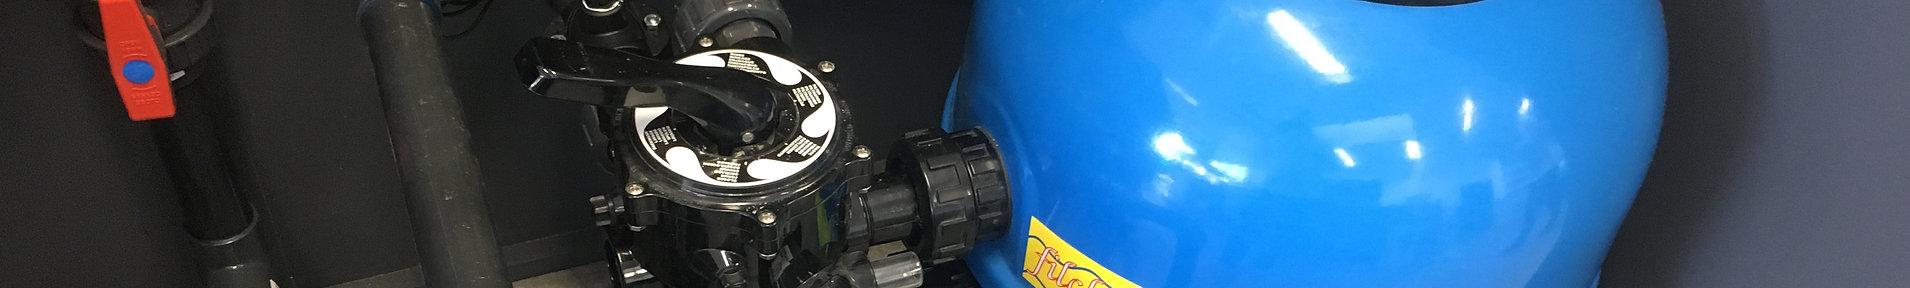 Filtration piscine irriPool